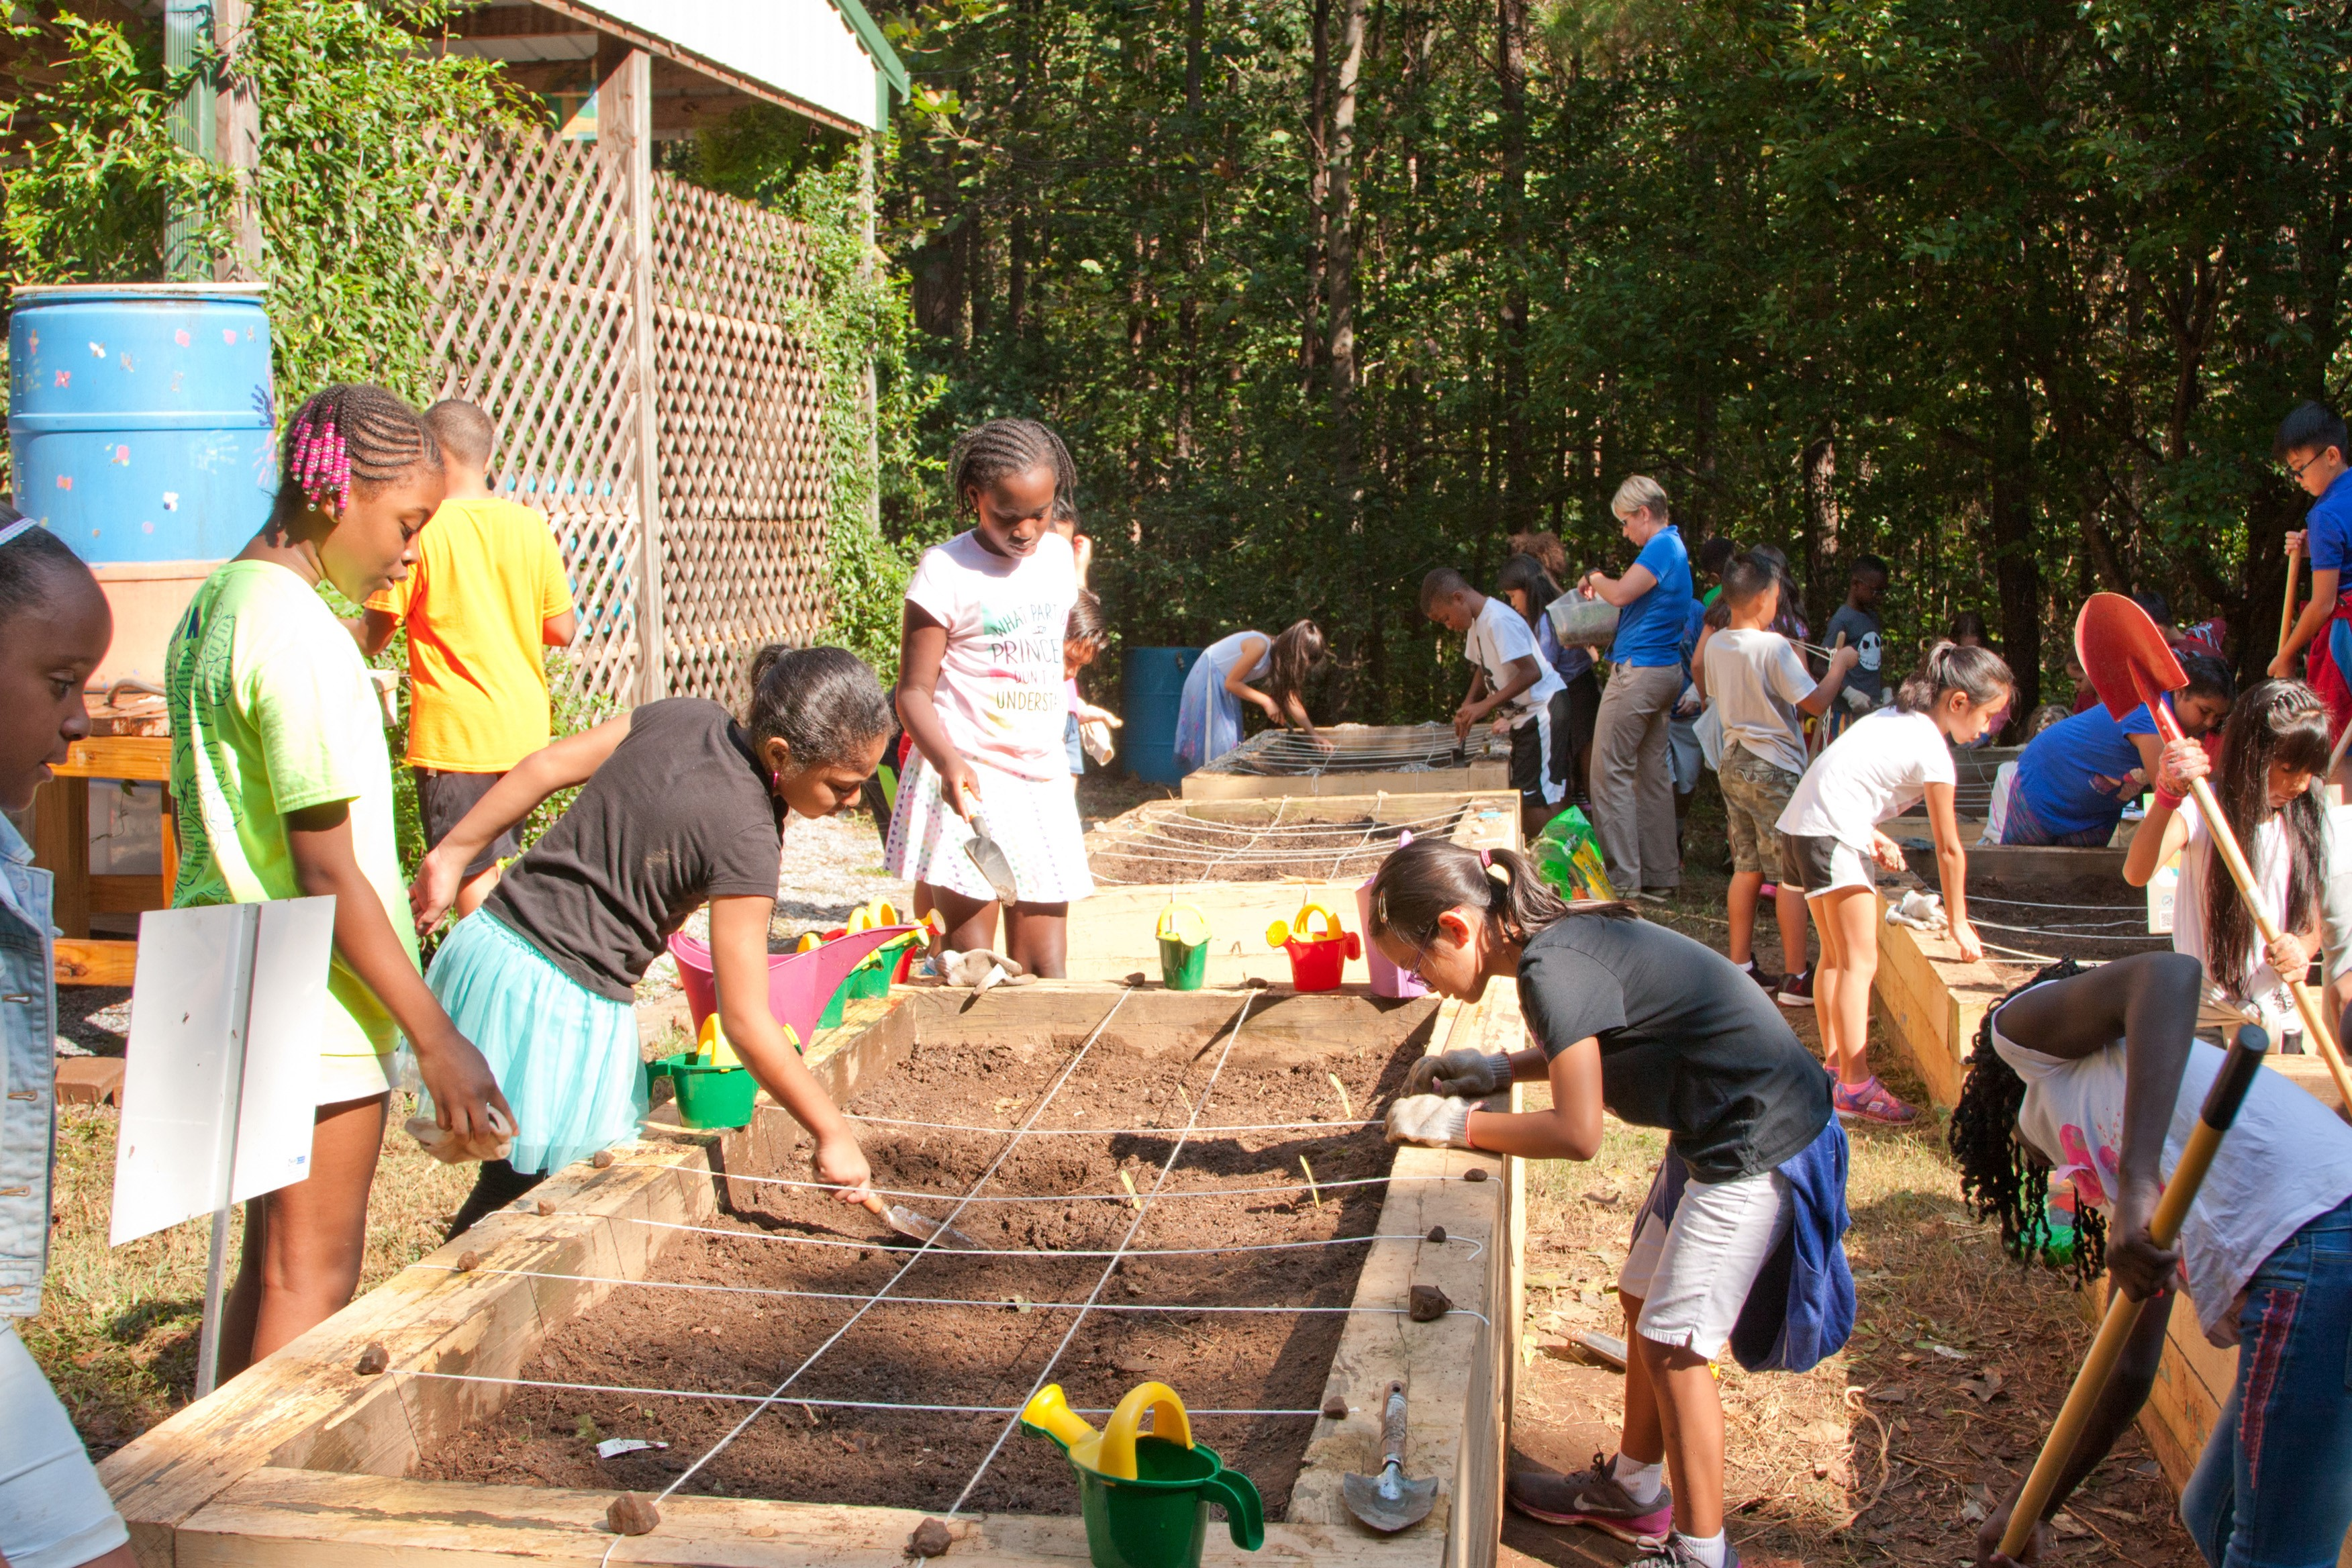 Mason Elementary students gardening